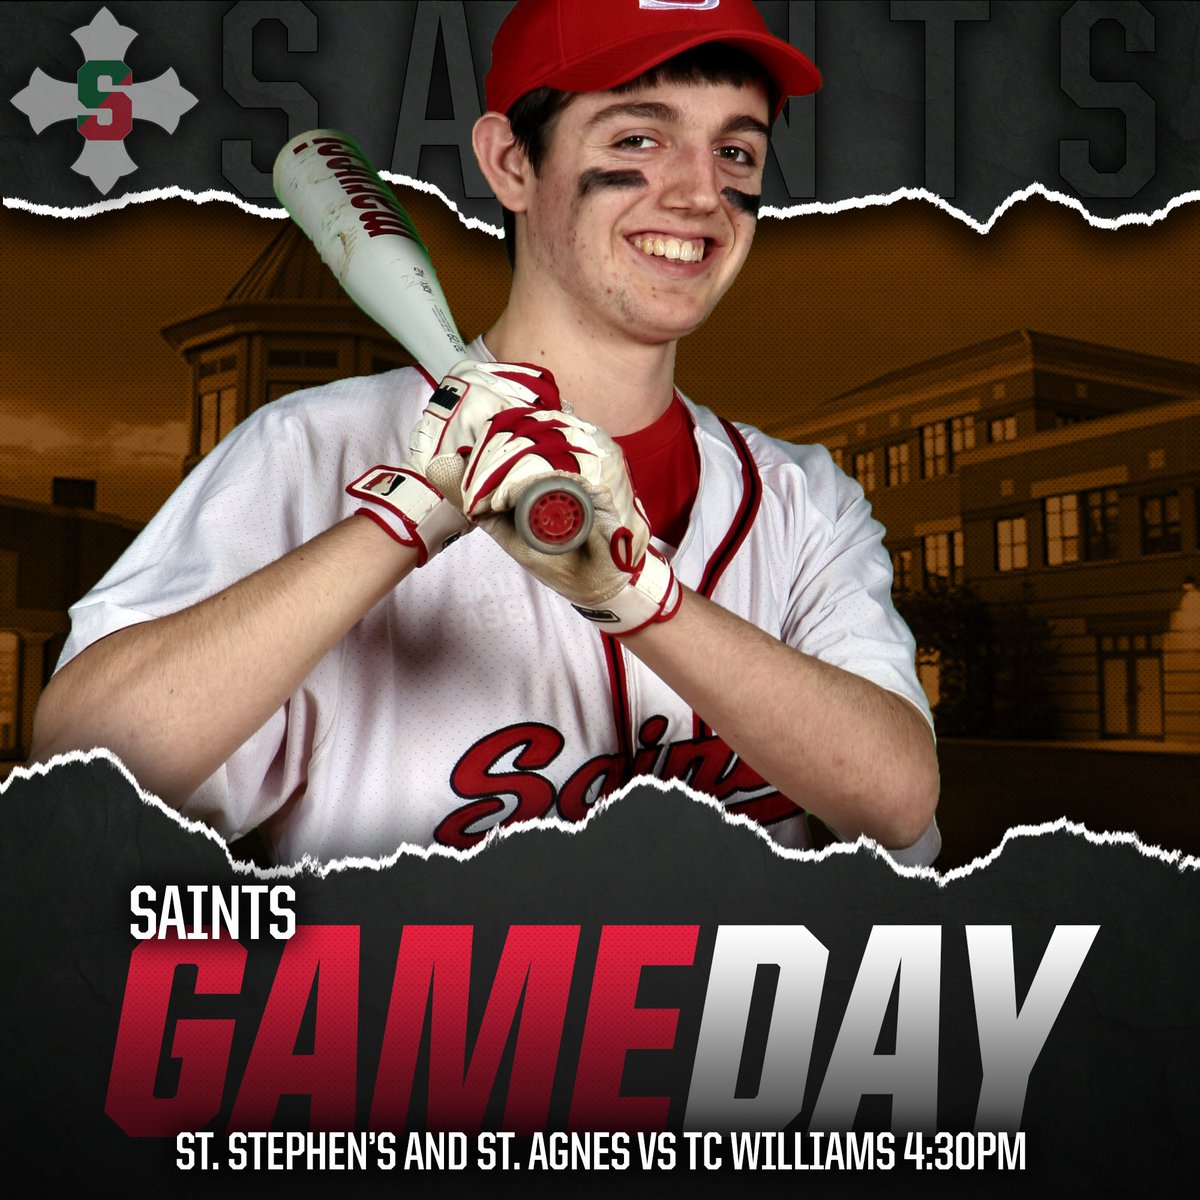 #saintspride